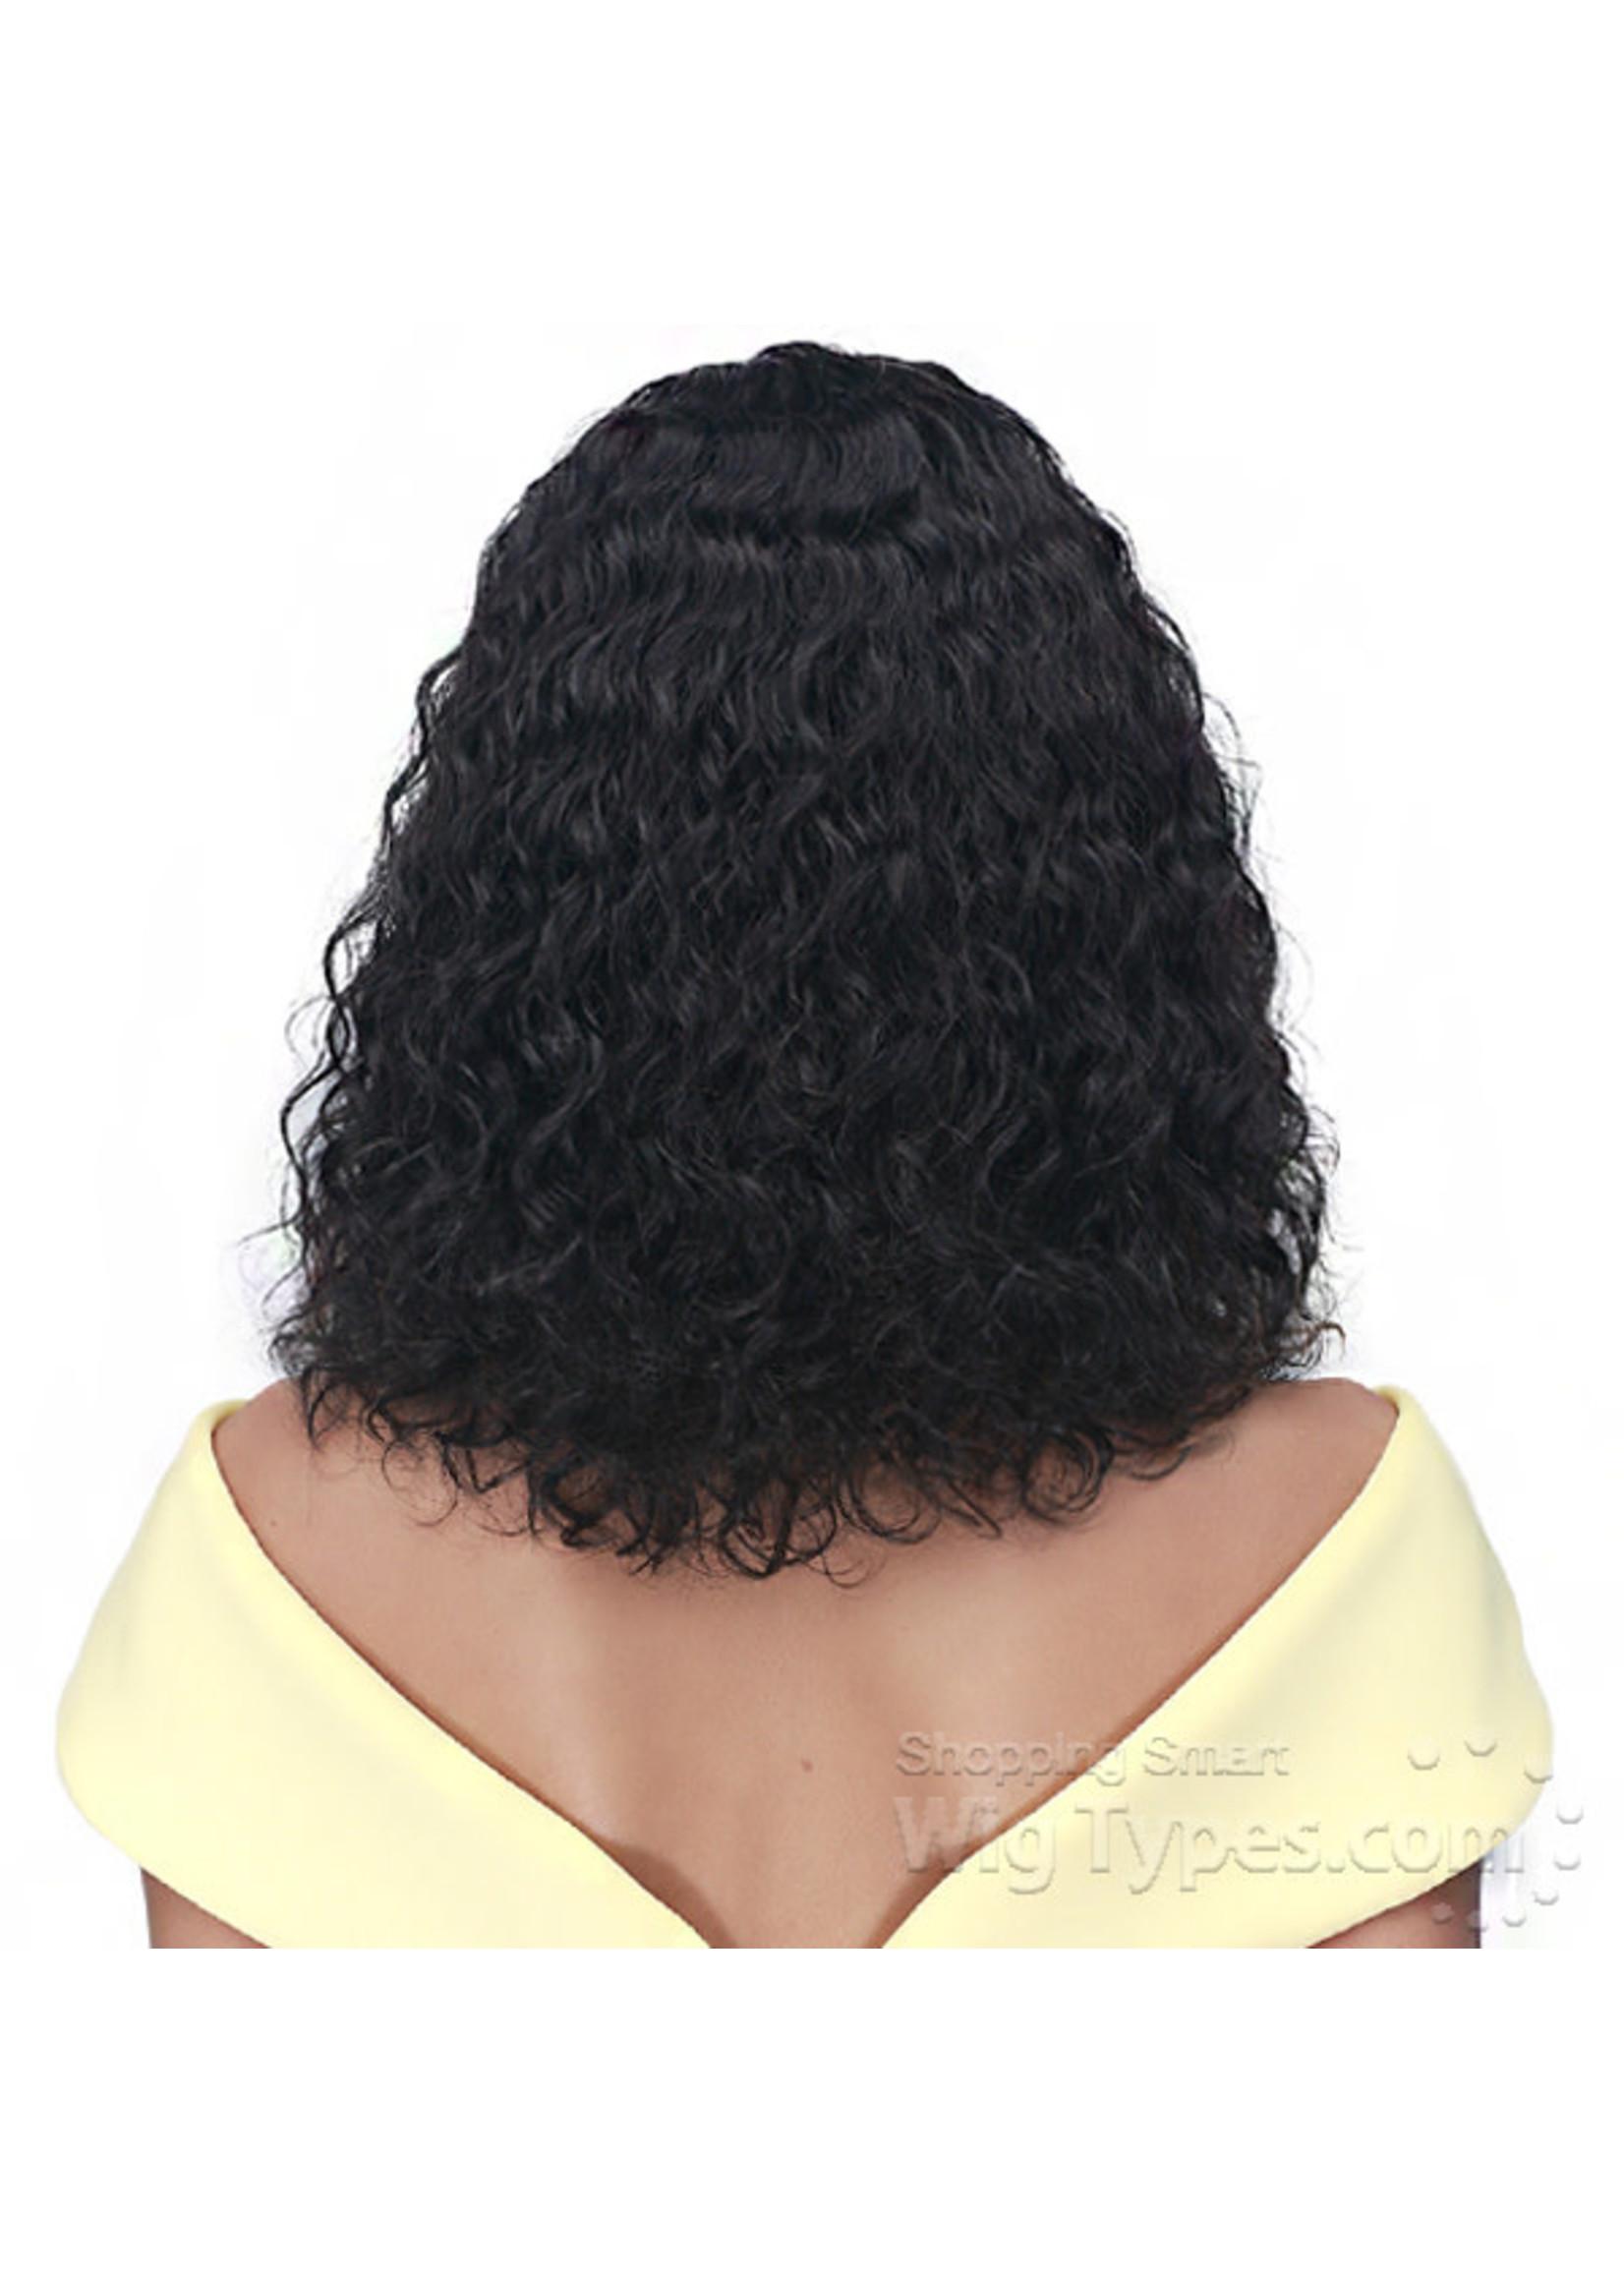 Bobbi Boss Boss Lace HH Wig- Cecelia